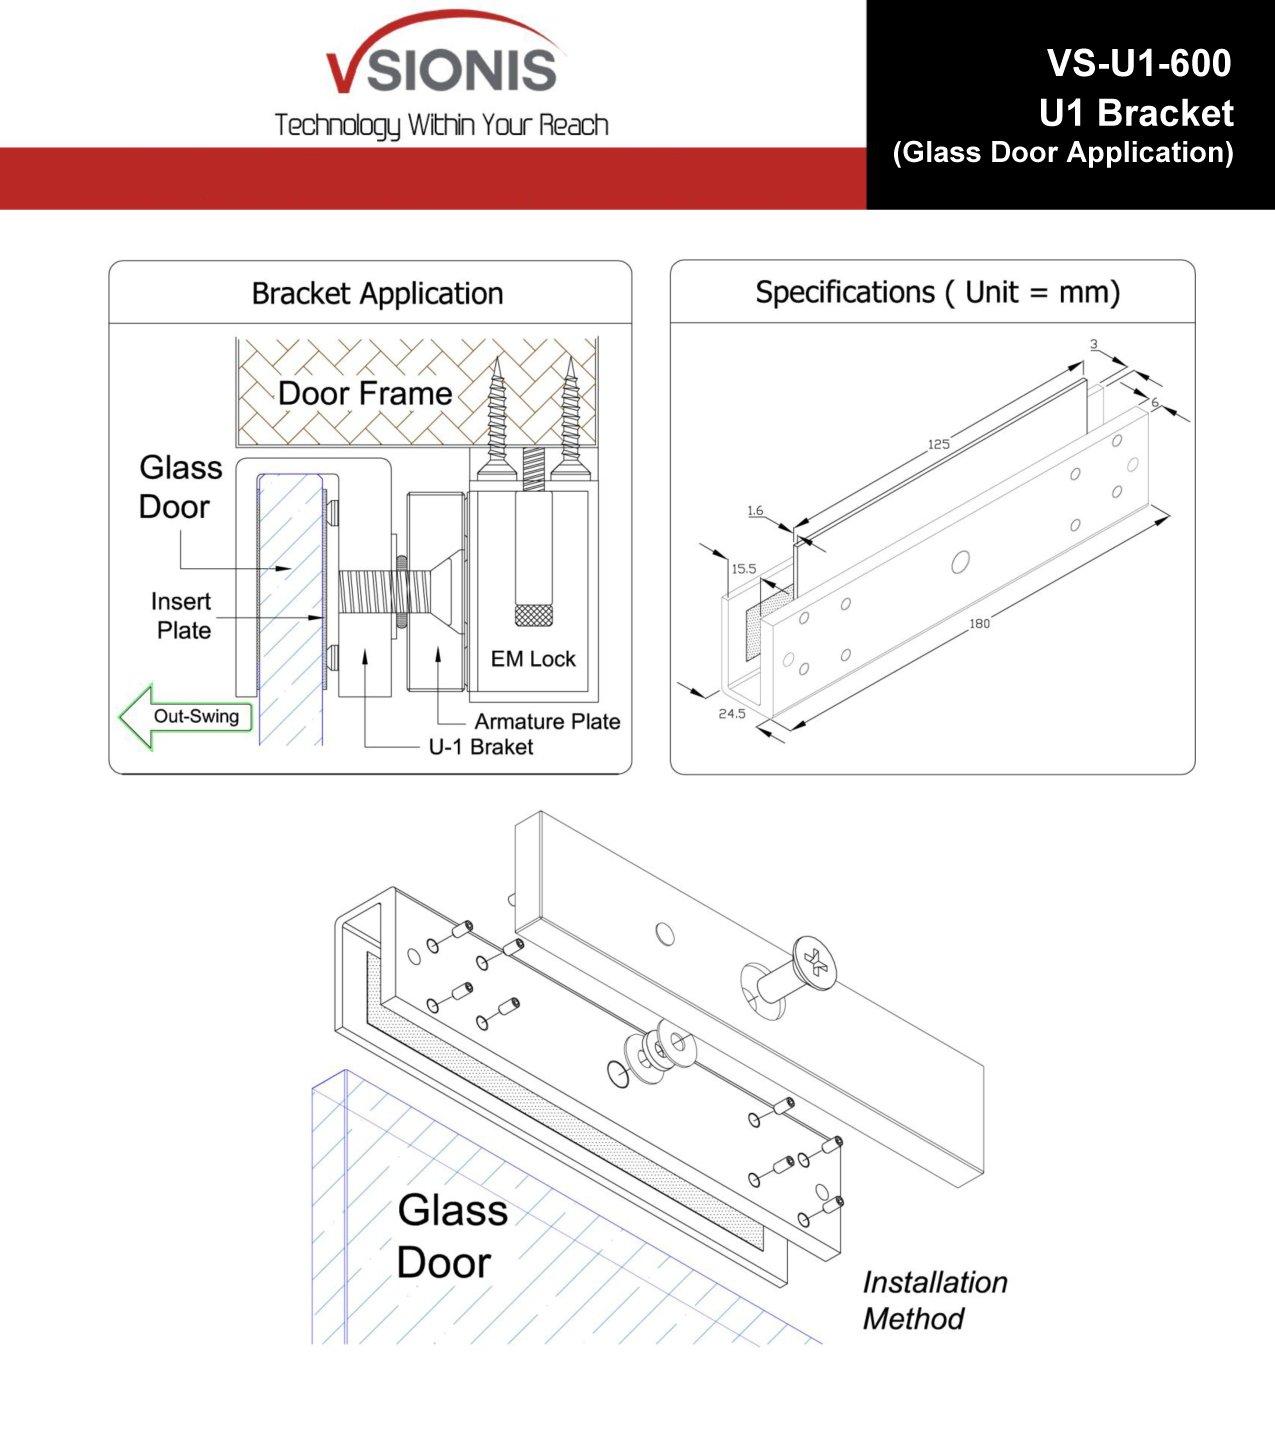 Visionis FPC-5225 600 lbs Indoor Electromagnetic Lock with 600 lbs U Bracket for Glass Door